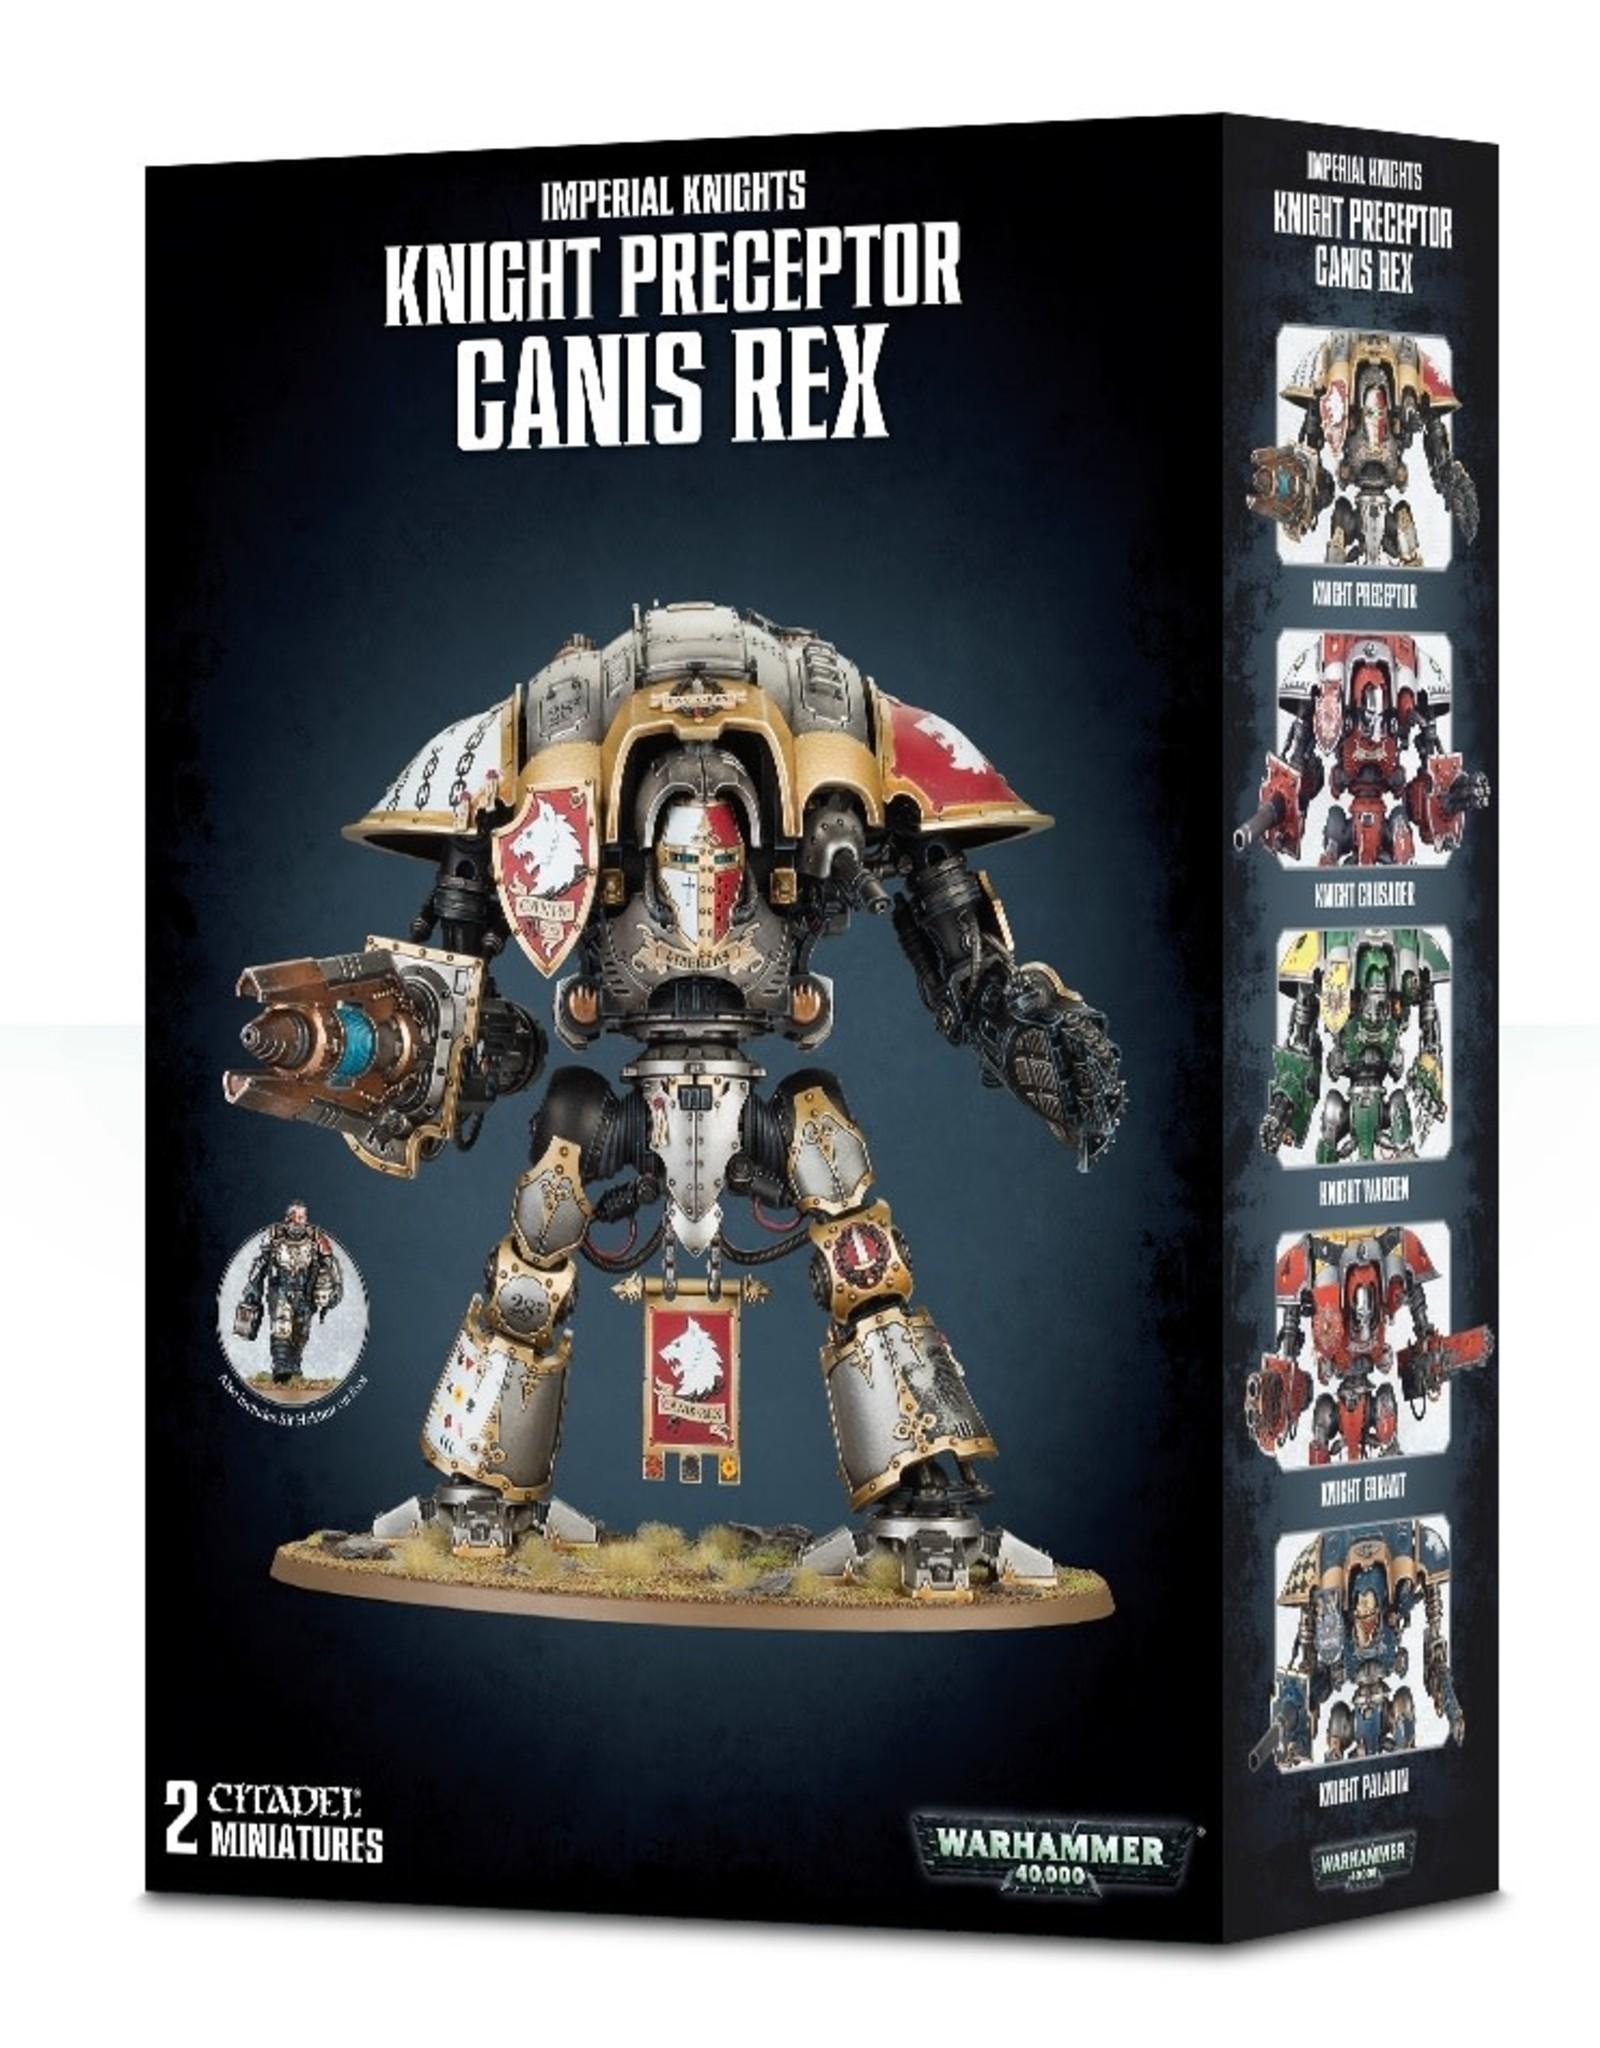 Games Workshop Warhammer 40K: Imperial Knights Knight Preceptor Canis Rex